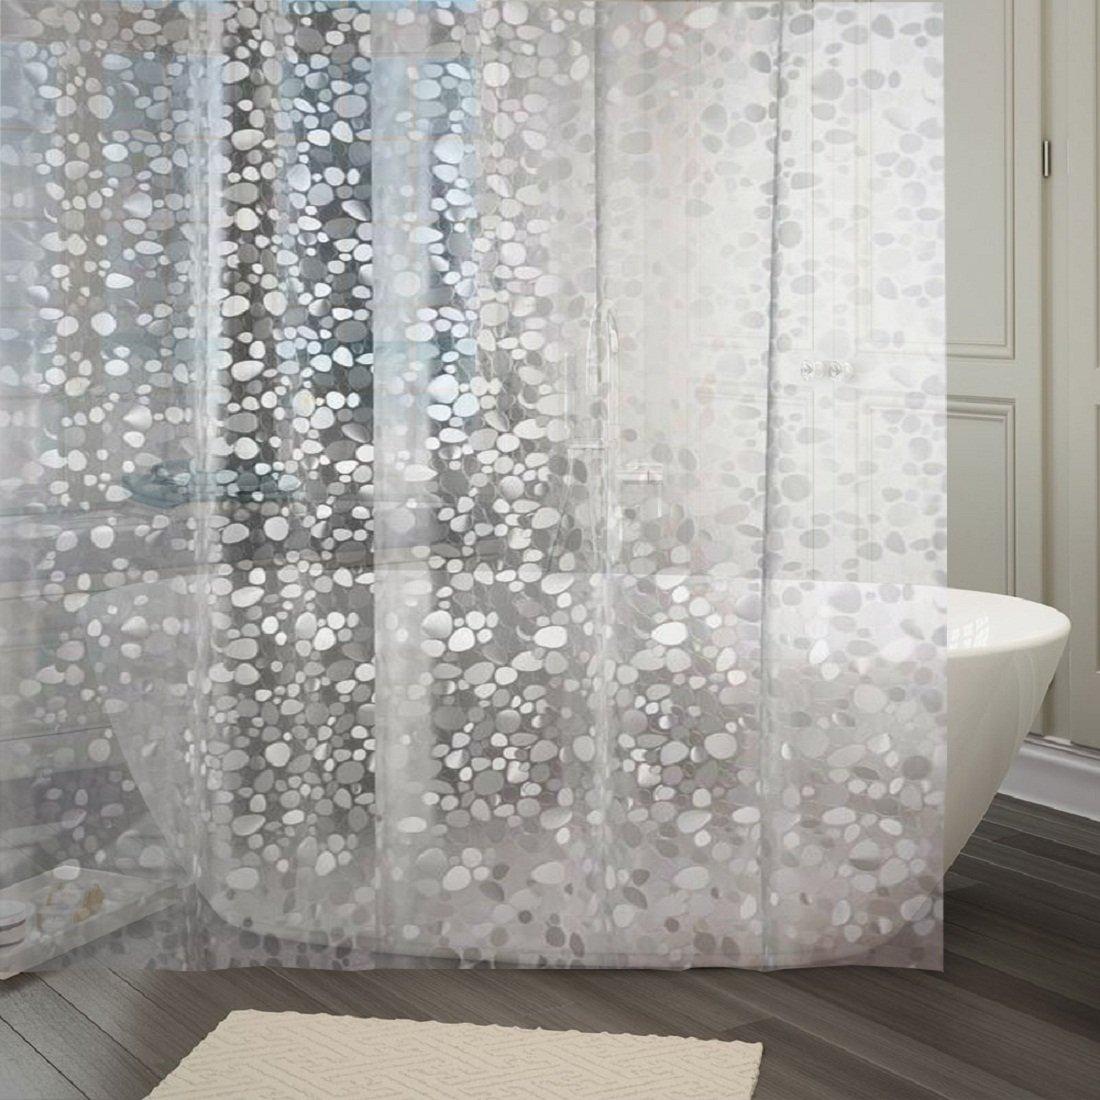 jalati john textiles robshaw curtains shower curtain indigo zoom sc